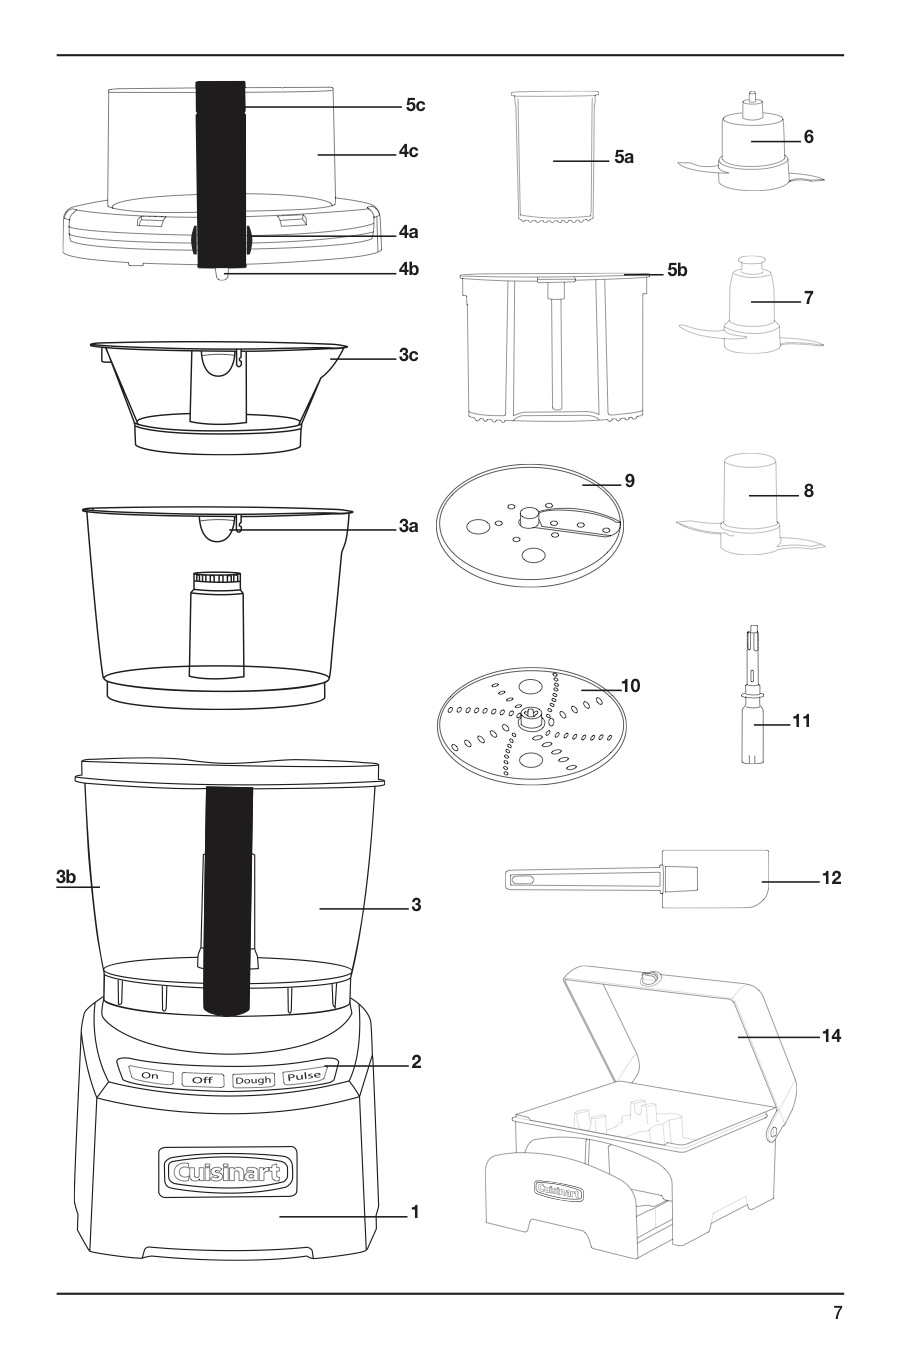 cuisinart smart power instruction manual